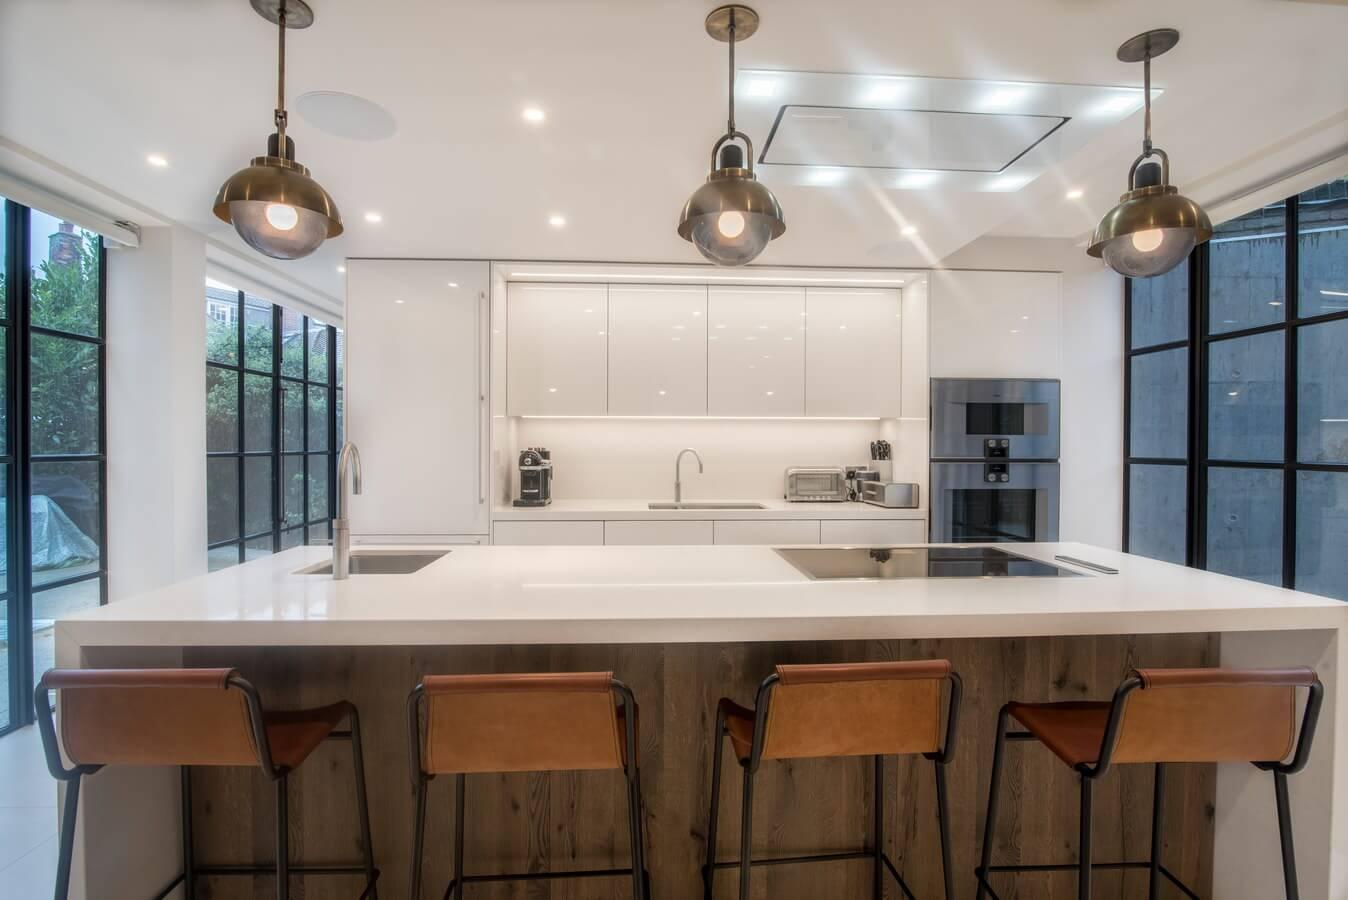 High-Gloss-White-German-Kitchen-With-Bulkhead.jpg